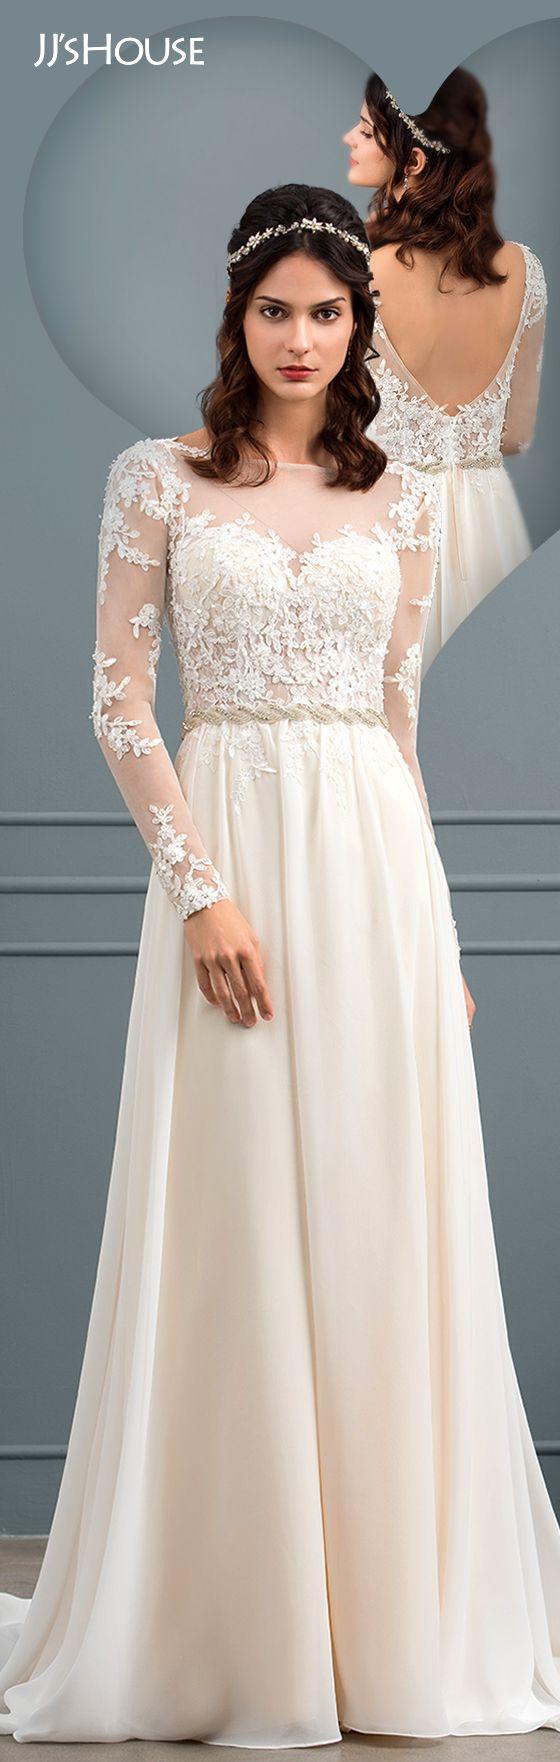 Alineprincess scoop neck court train chiffon wedding dress with